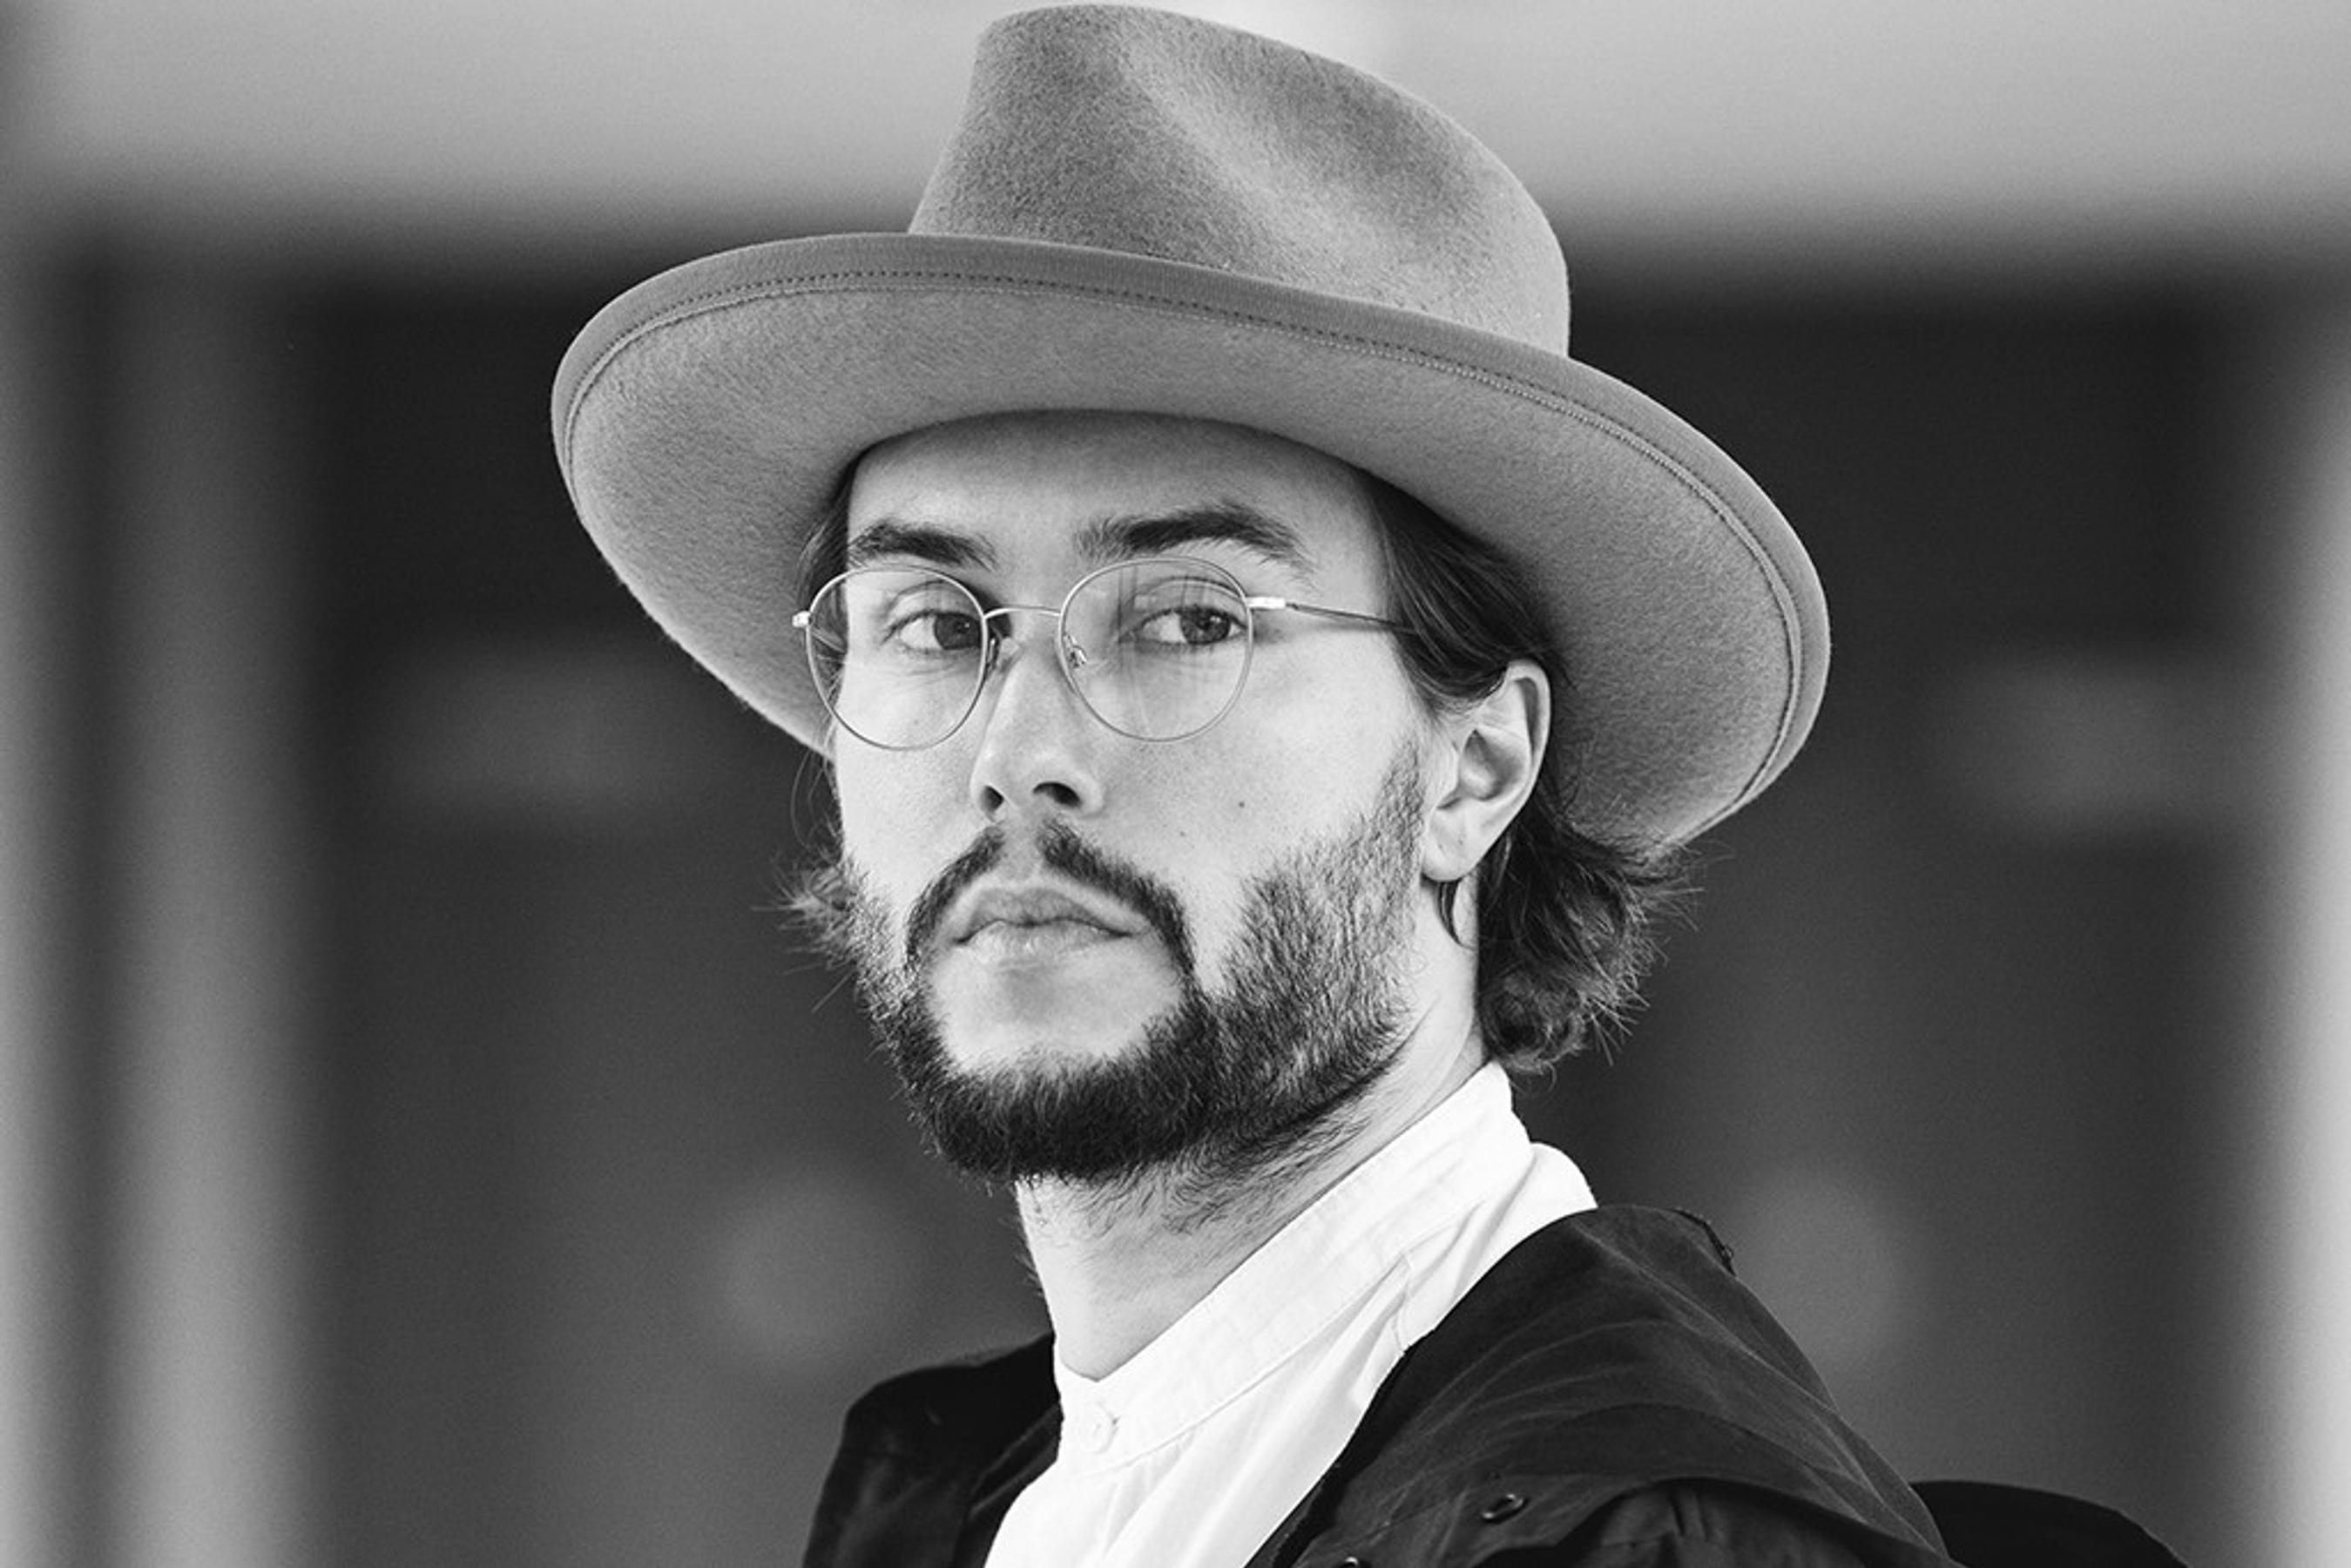 Tobias Ellehammer